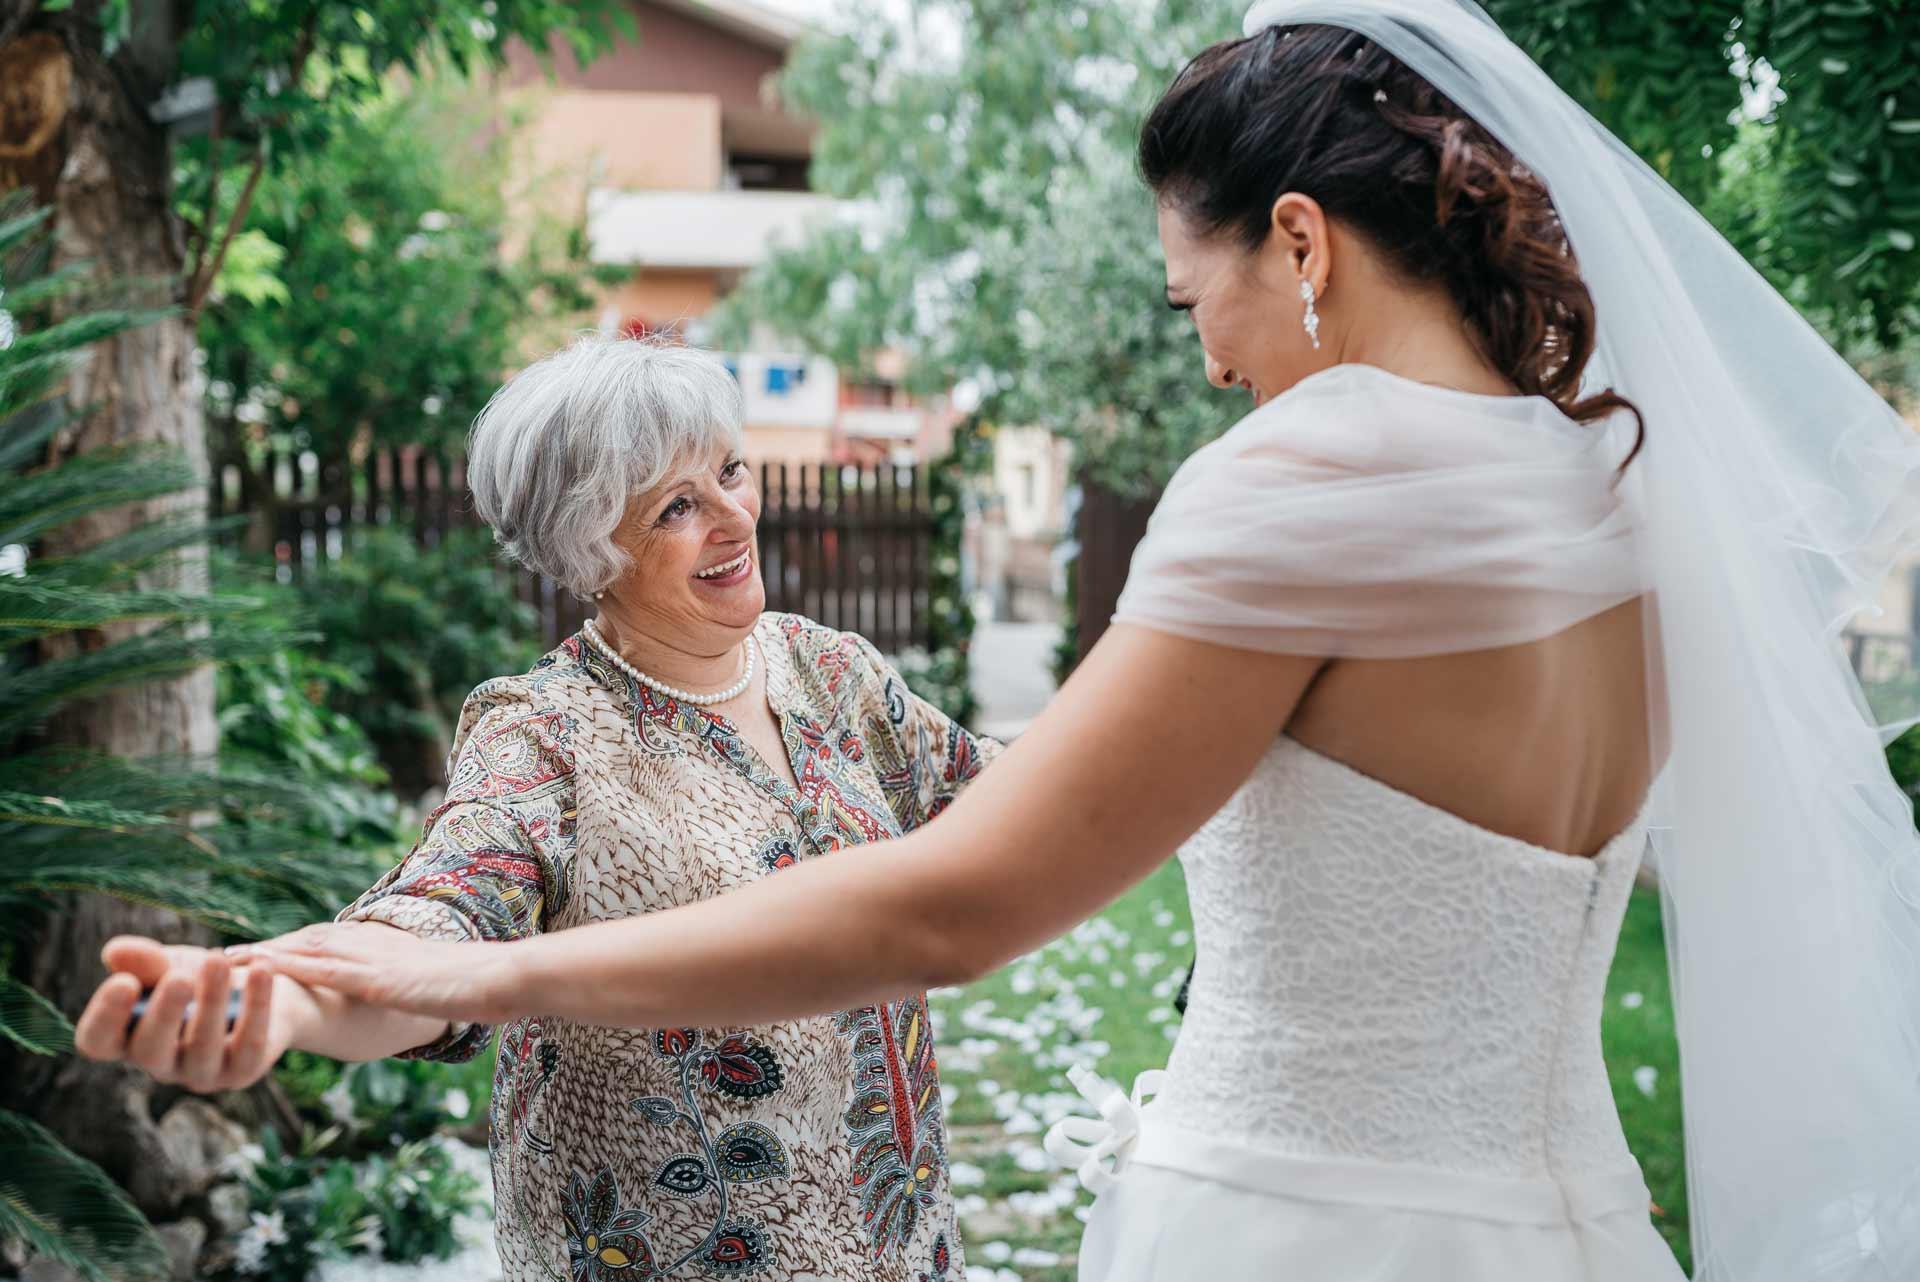 Candid-wedding-photos-5